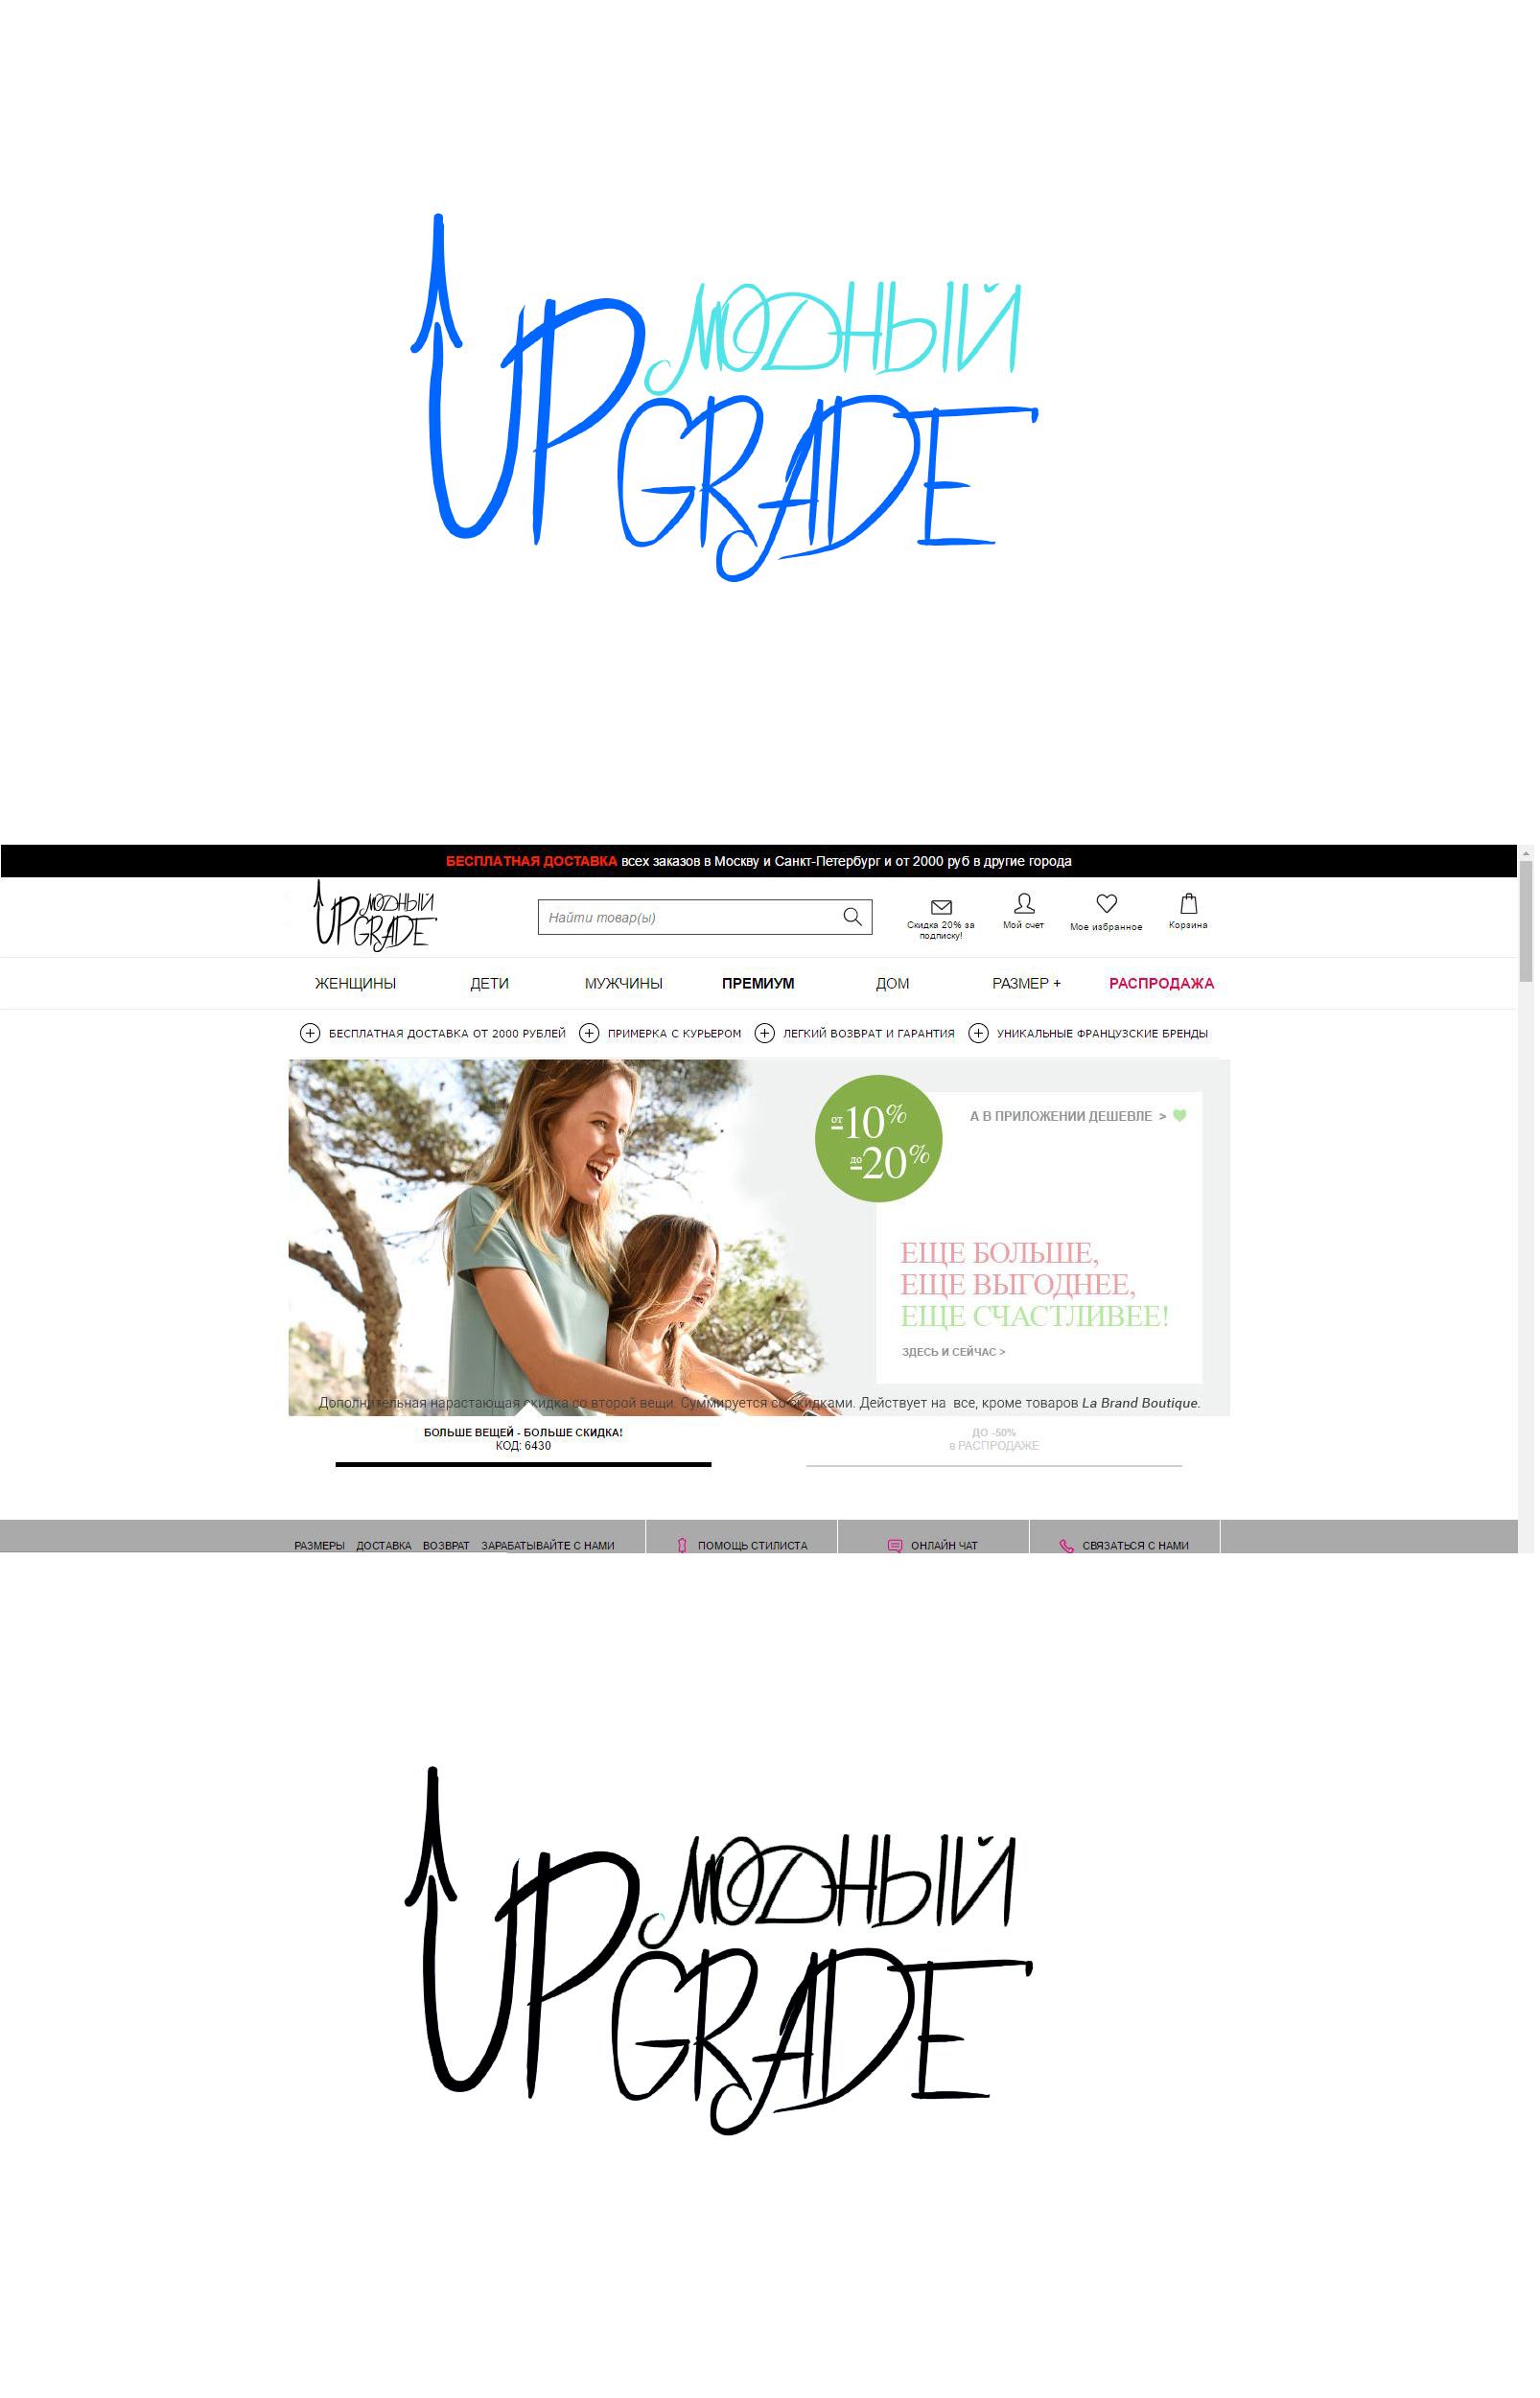 "Логотип интернет магазина ""Модный UPGRADE"" фото f_3295949684c93fc0.jpg"